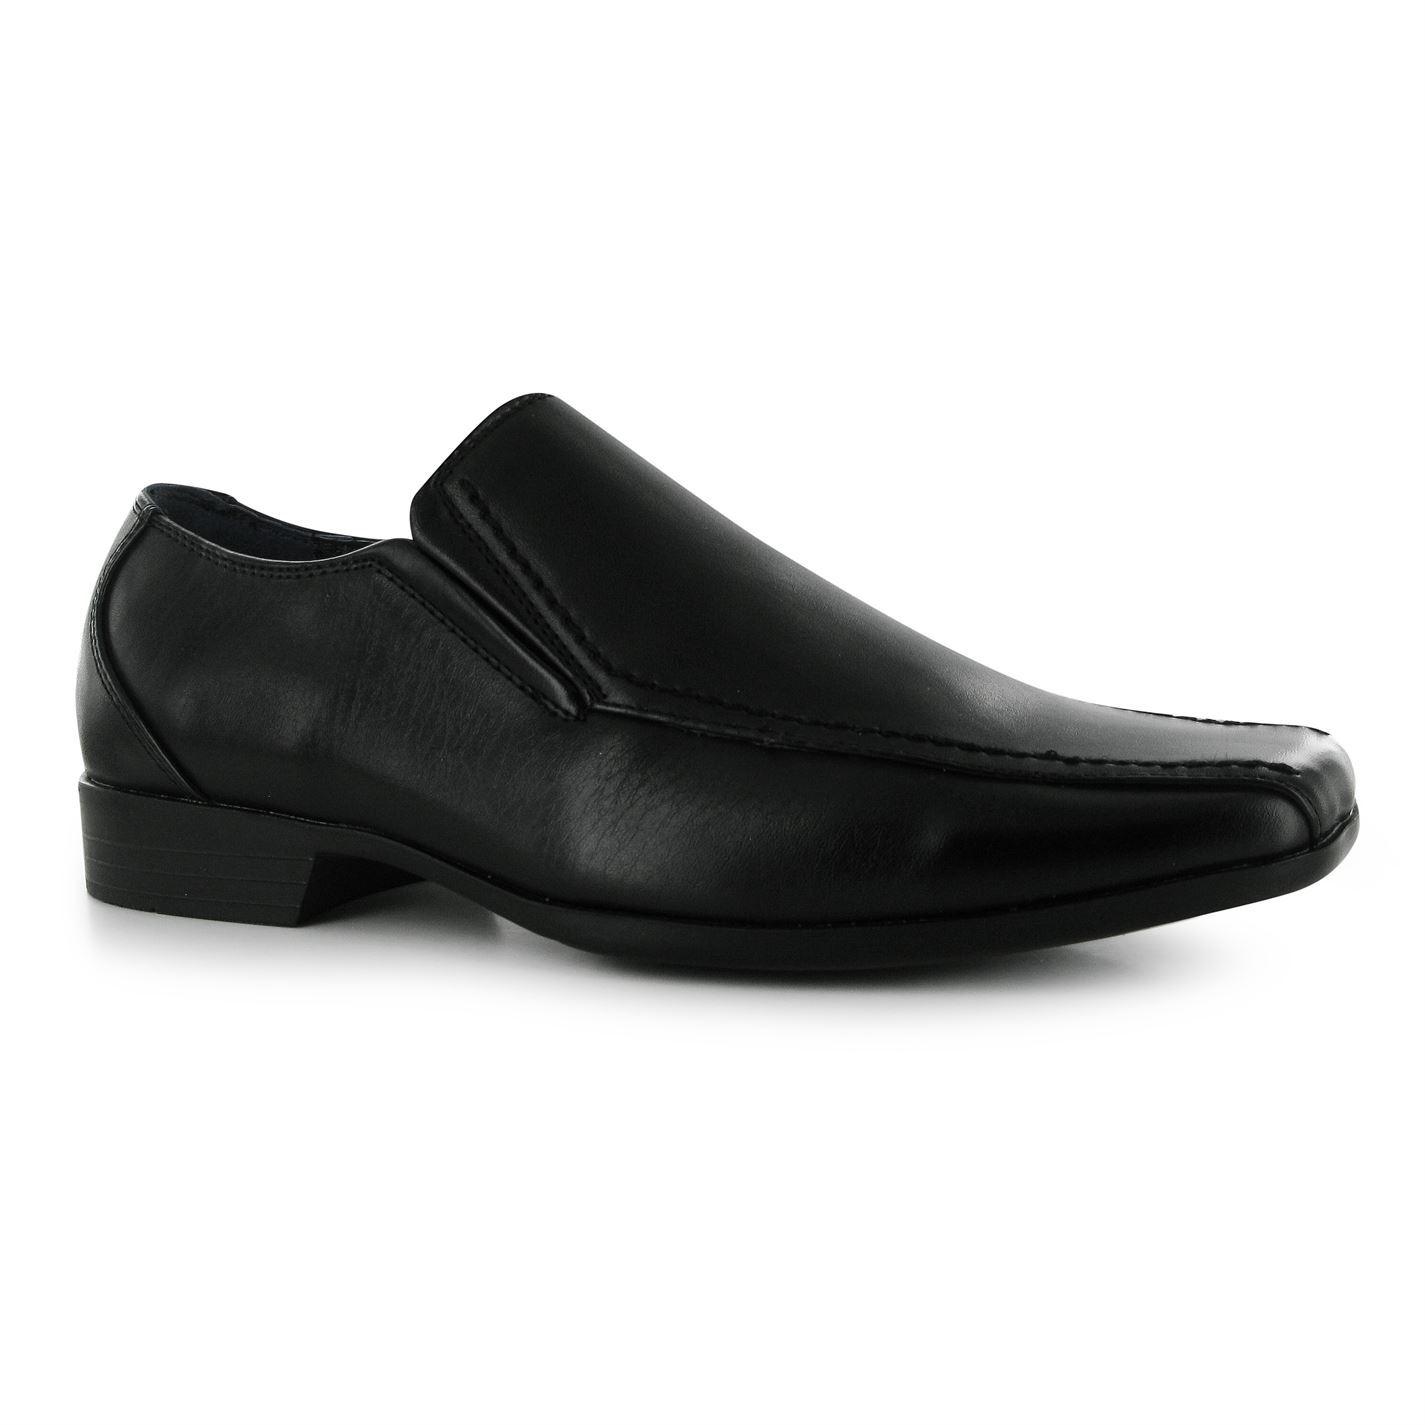 giorgio bourne work formal shoes slip on gents mens ebay